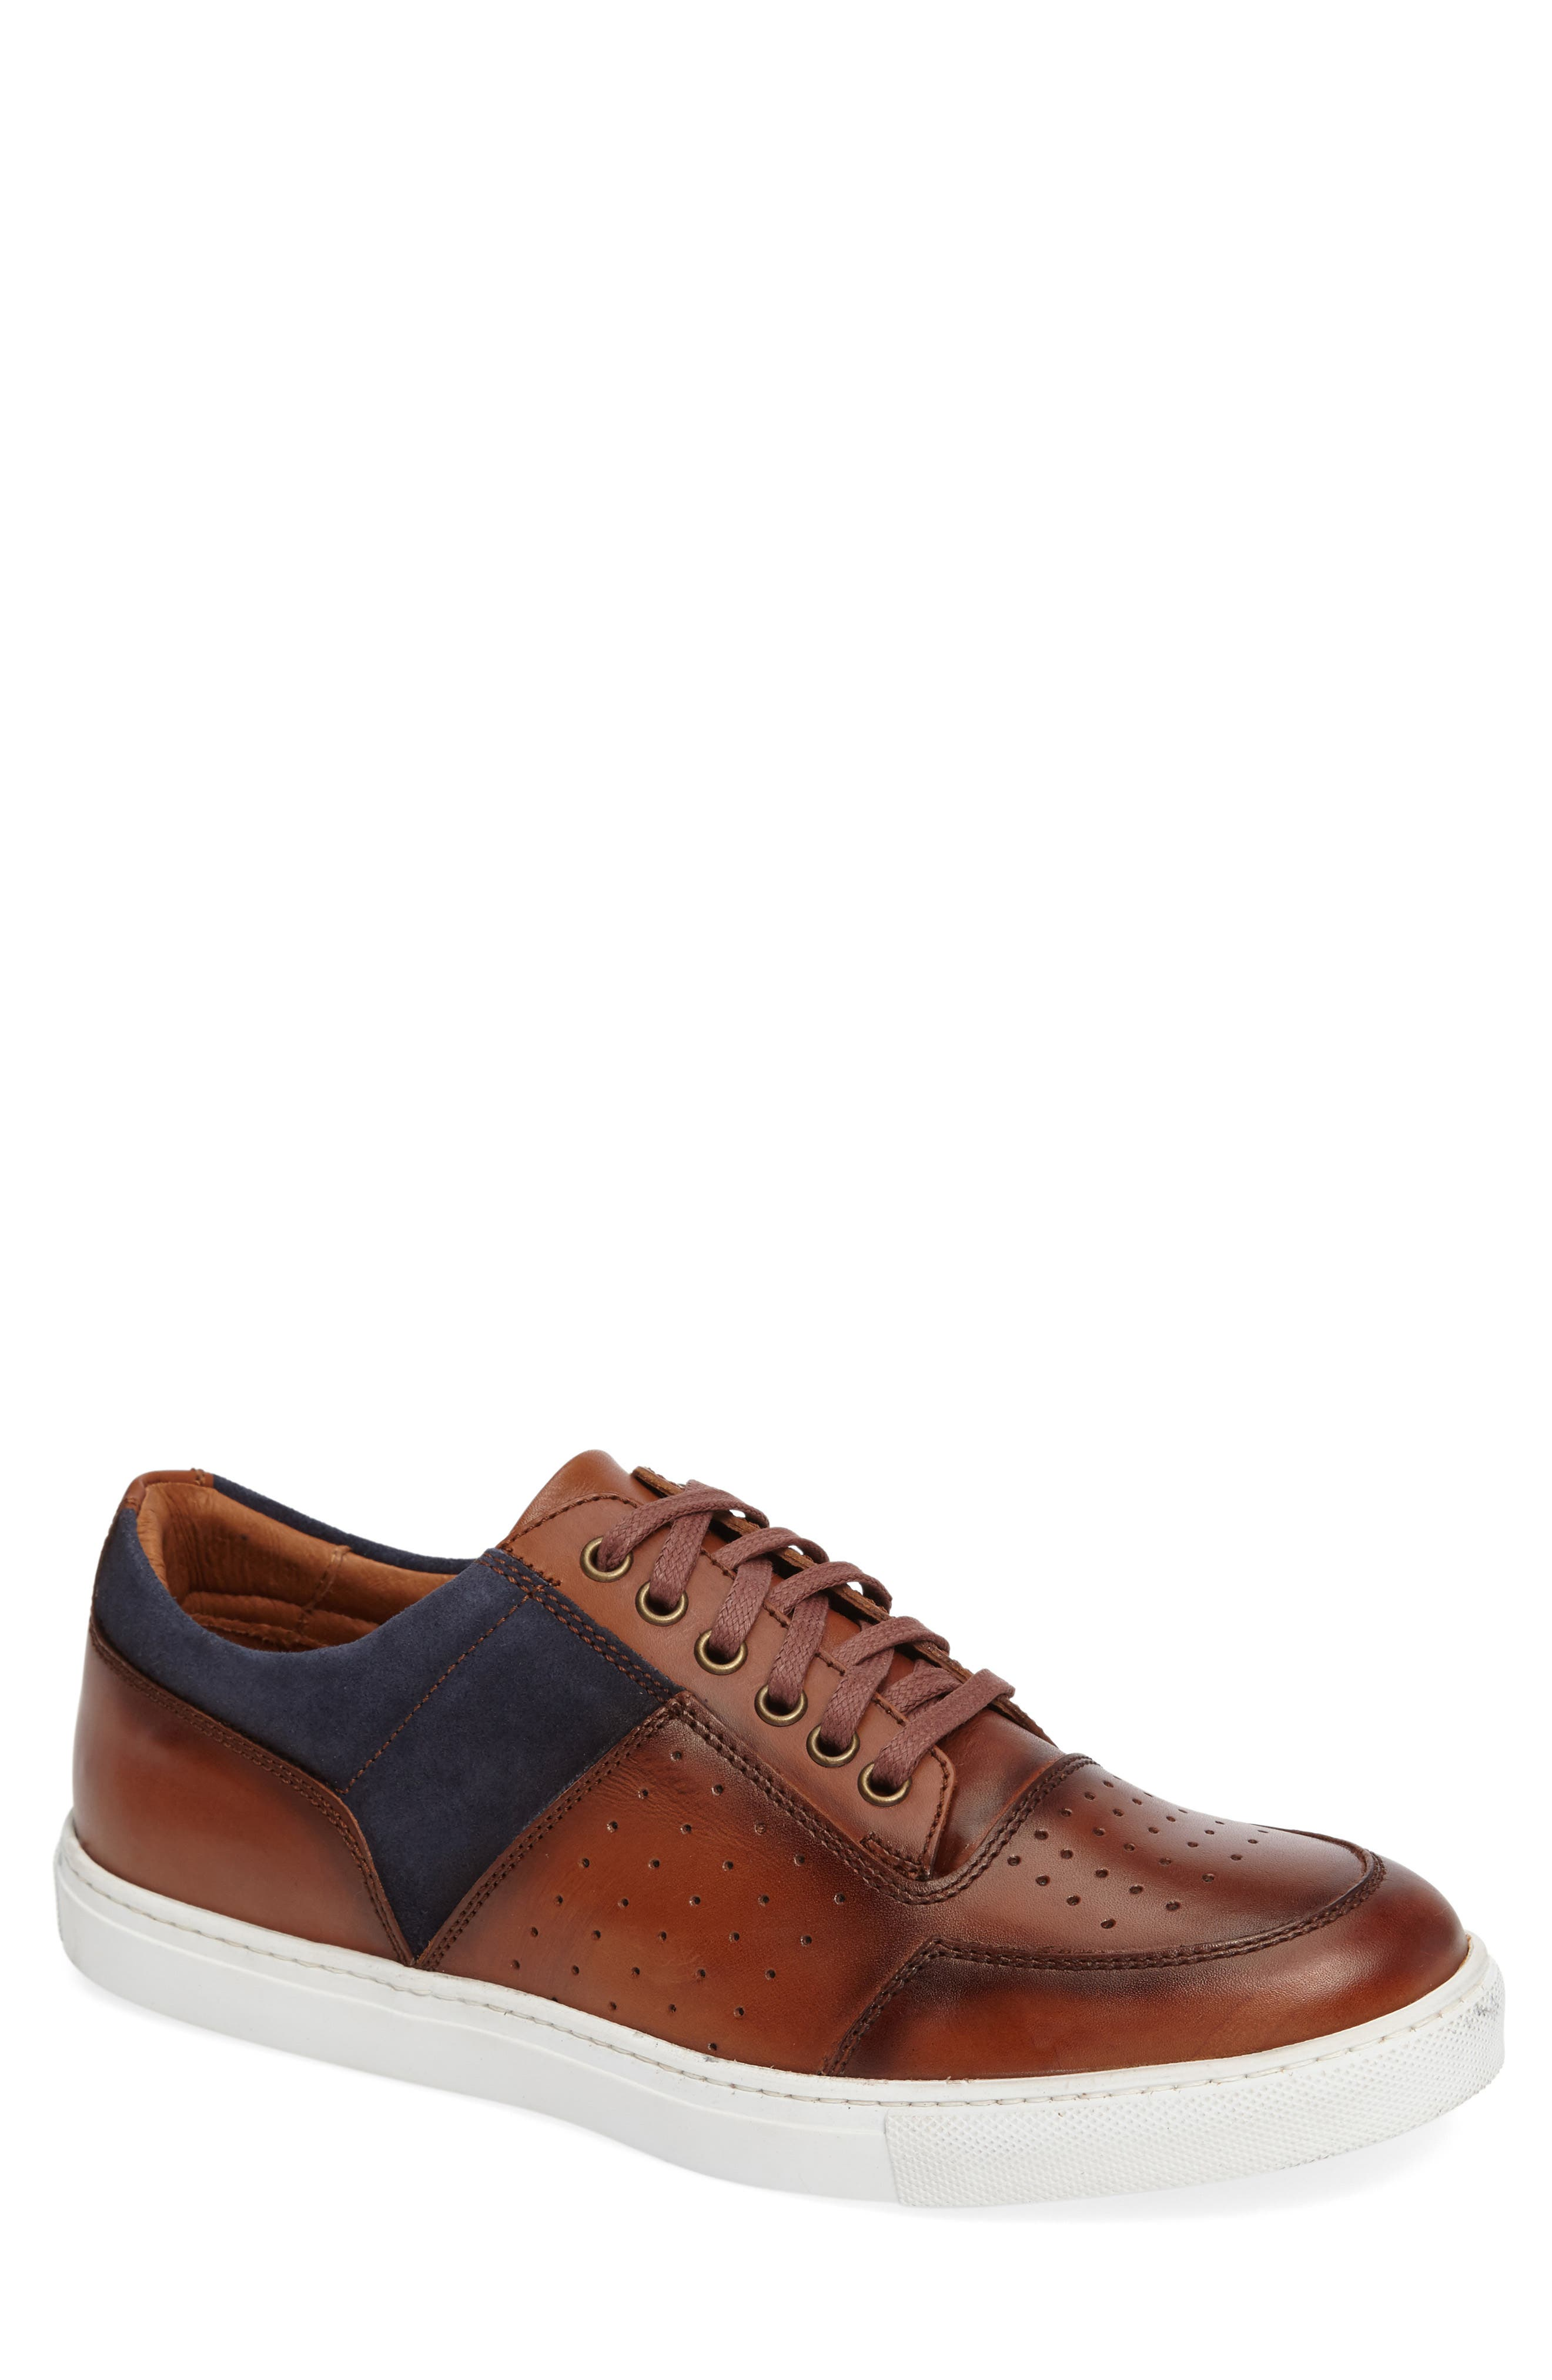 Prem-Ier Sneaker,                         Main,                         color, 200